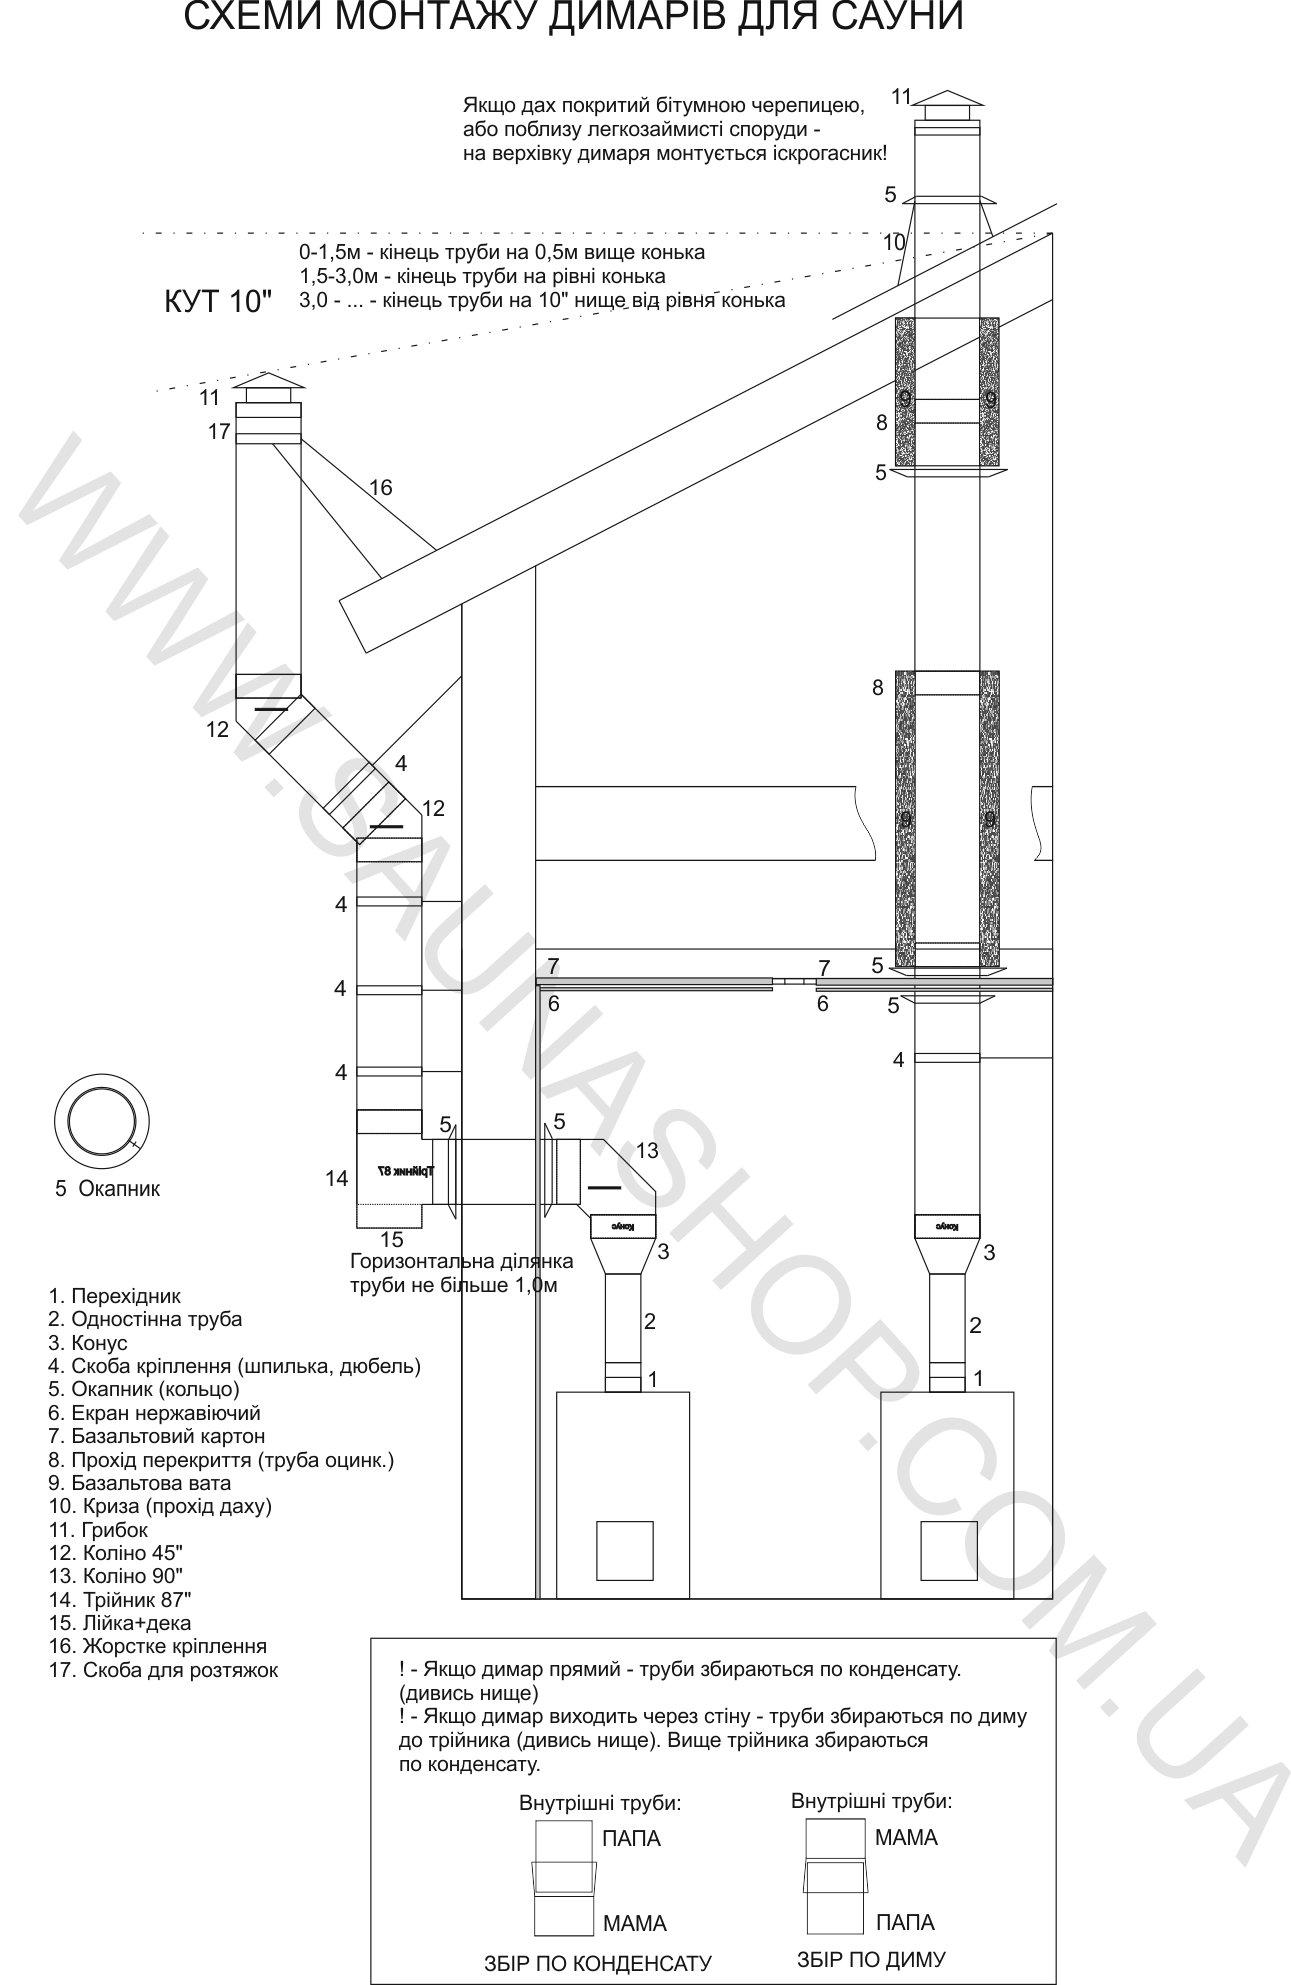 Схема монтажа дымохода для бани или сауны